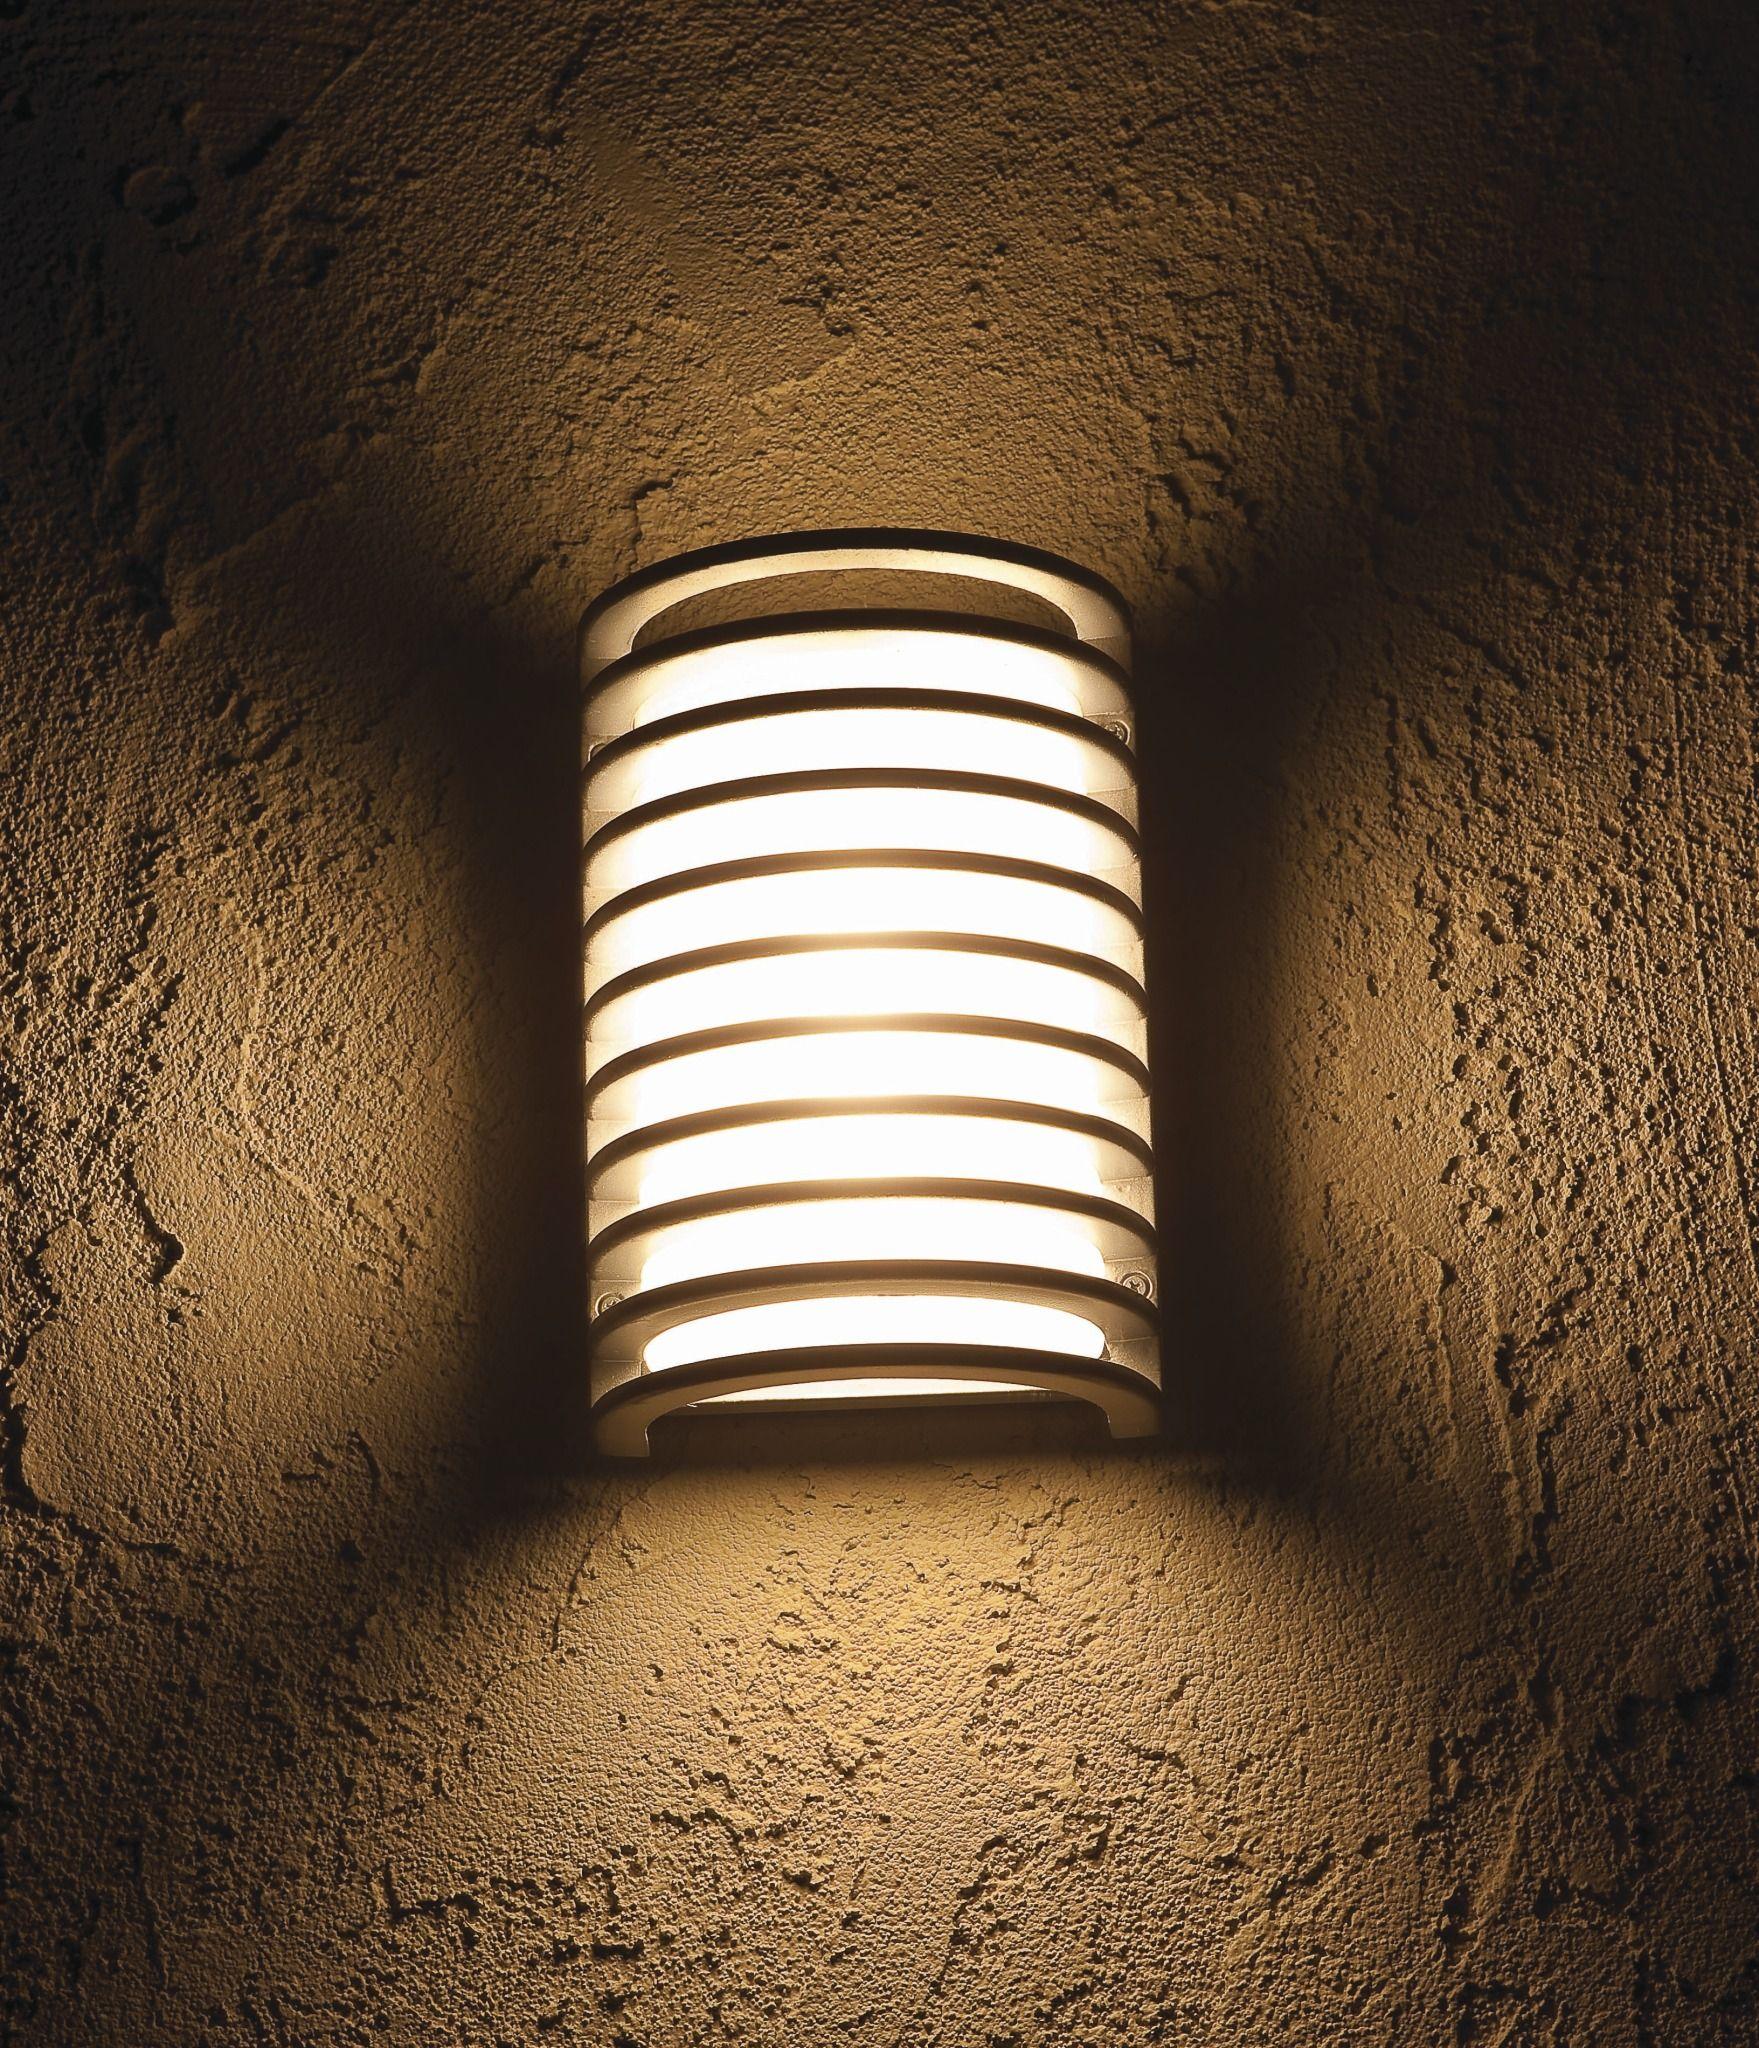 Access Lighting 20300ledmg Sat Rfr Poseidon Led Bulkhead